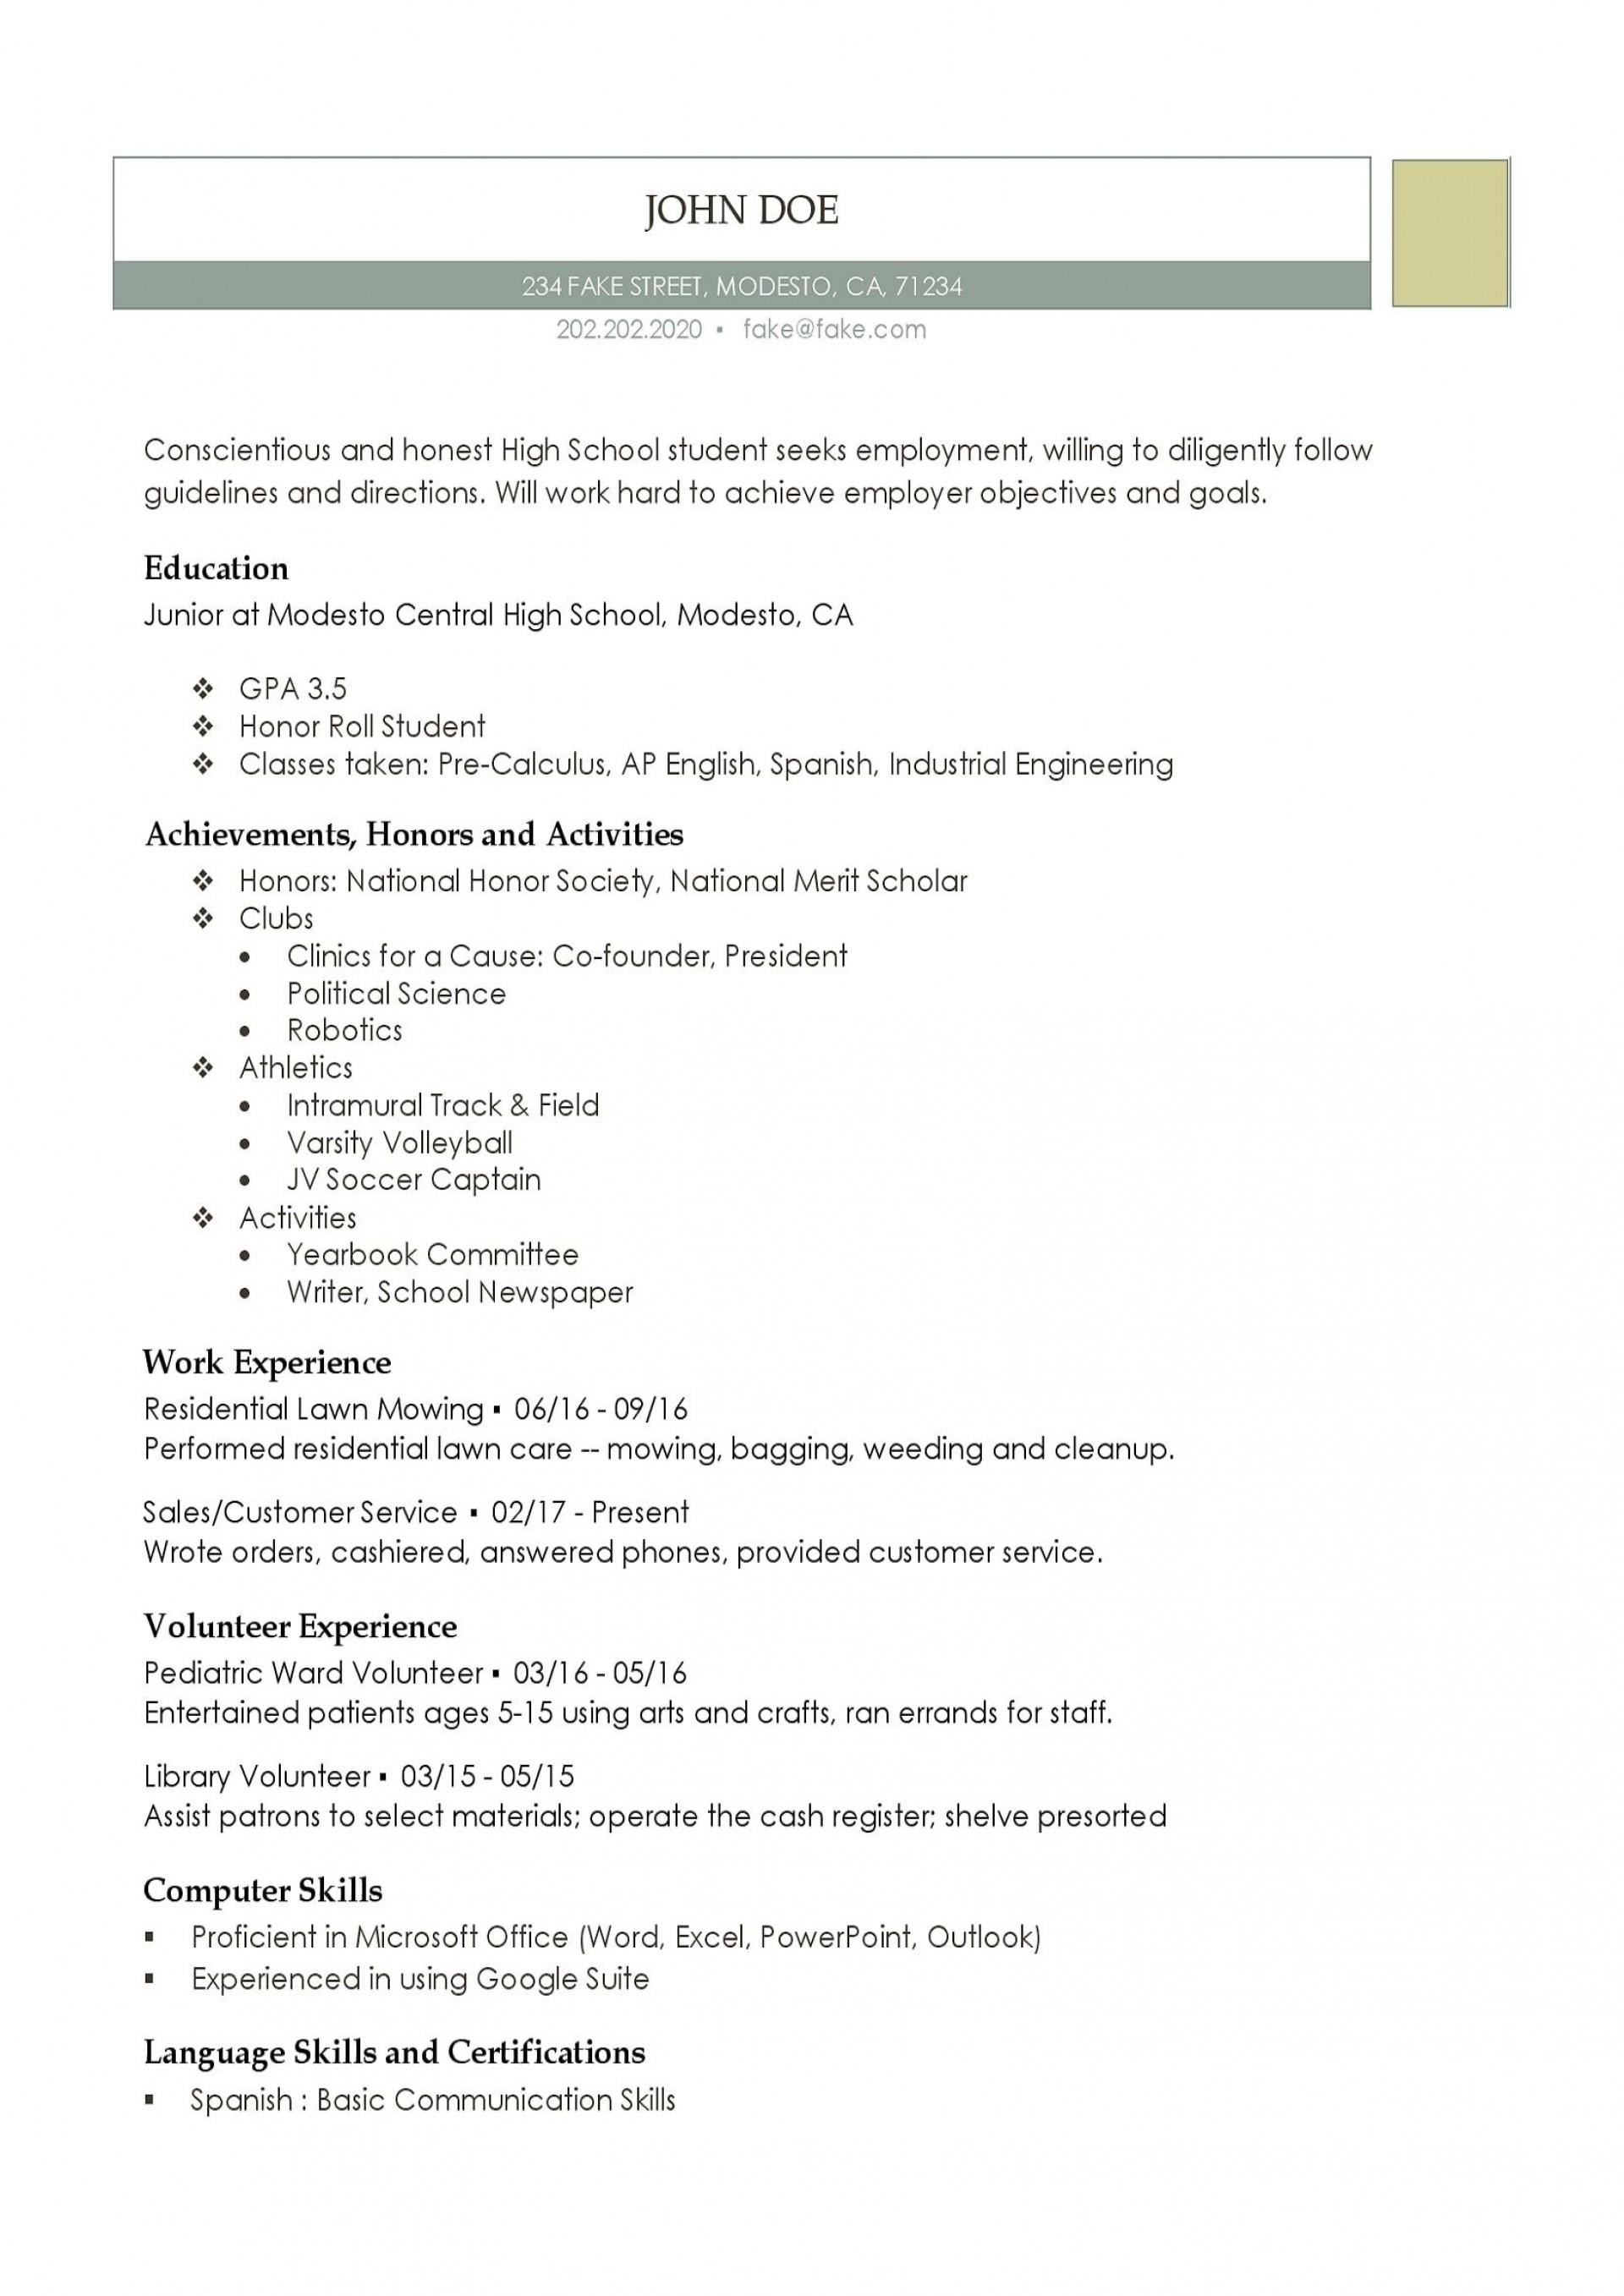 003 Unusual Basic Student Resume Template Picture  Simple Word High School Australia Google Doc1920